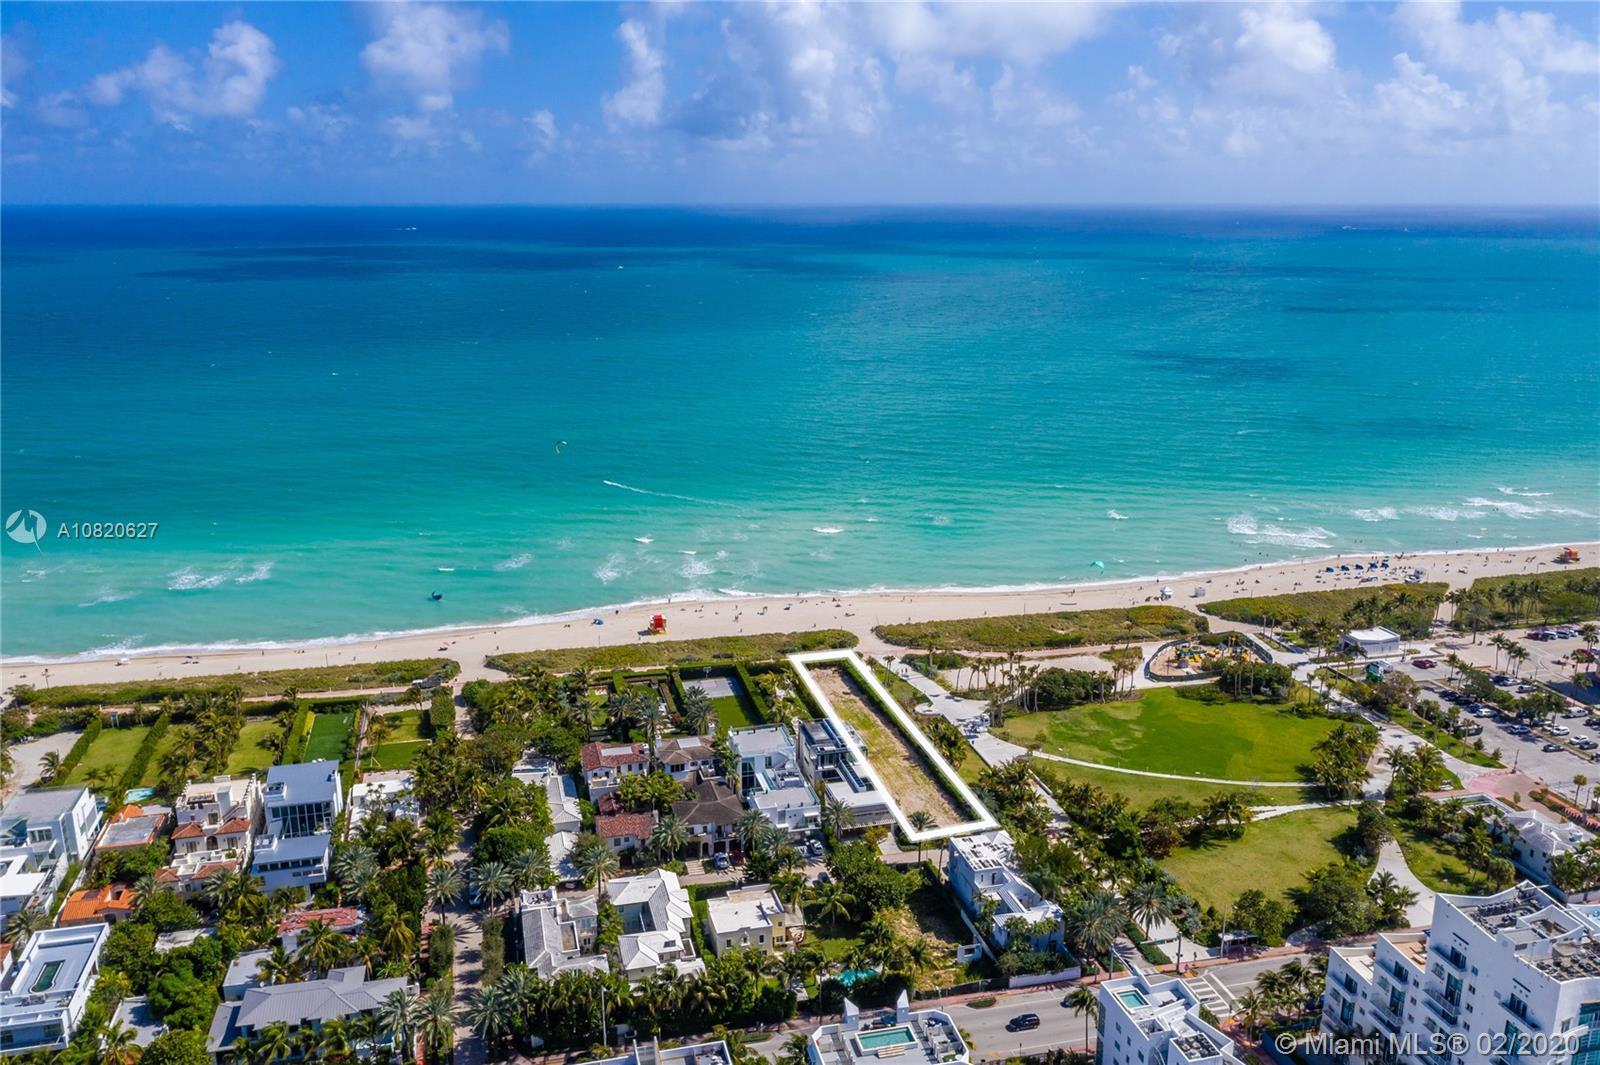 7701 Atlantic Way, Miami Beach, FL 33141